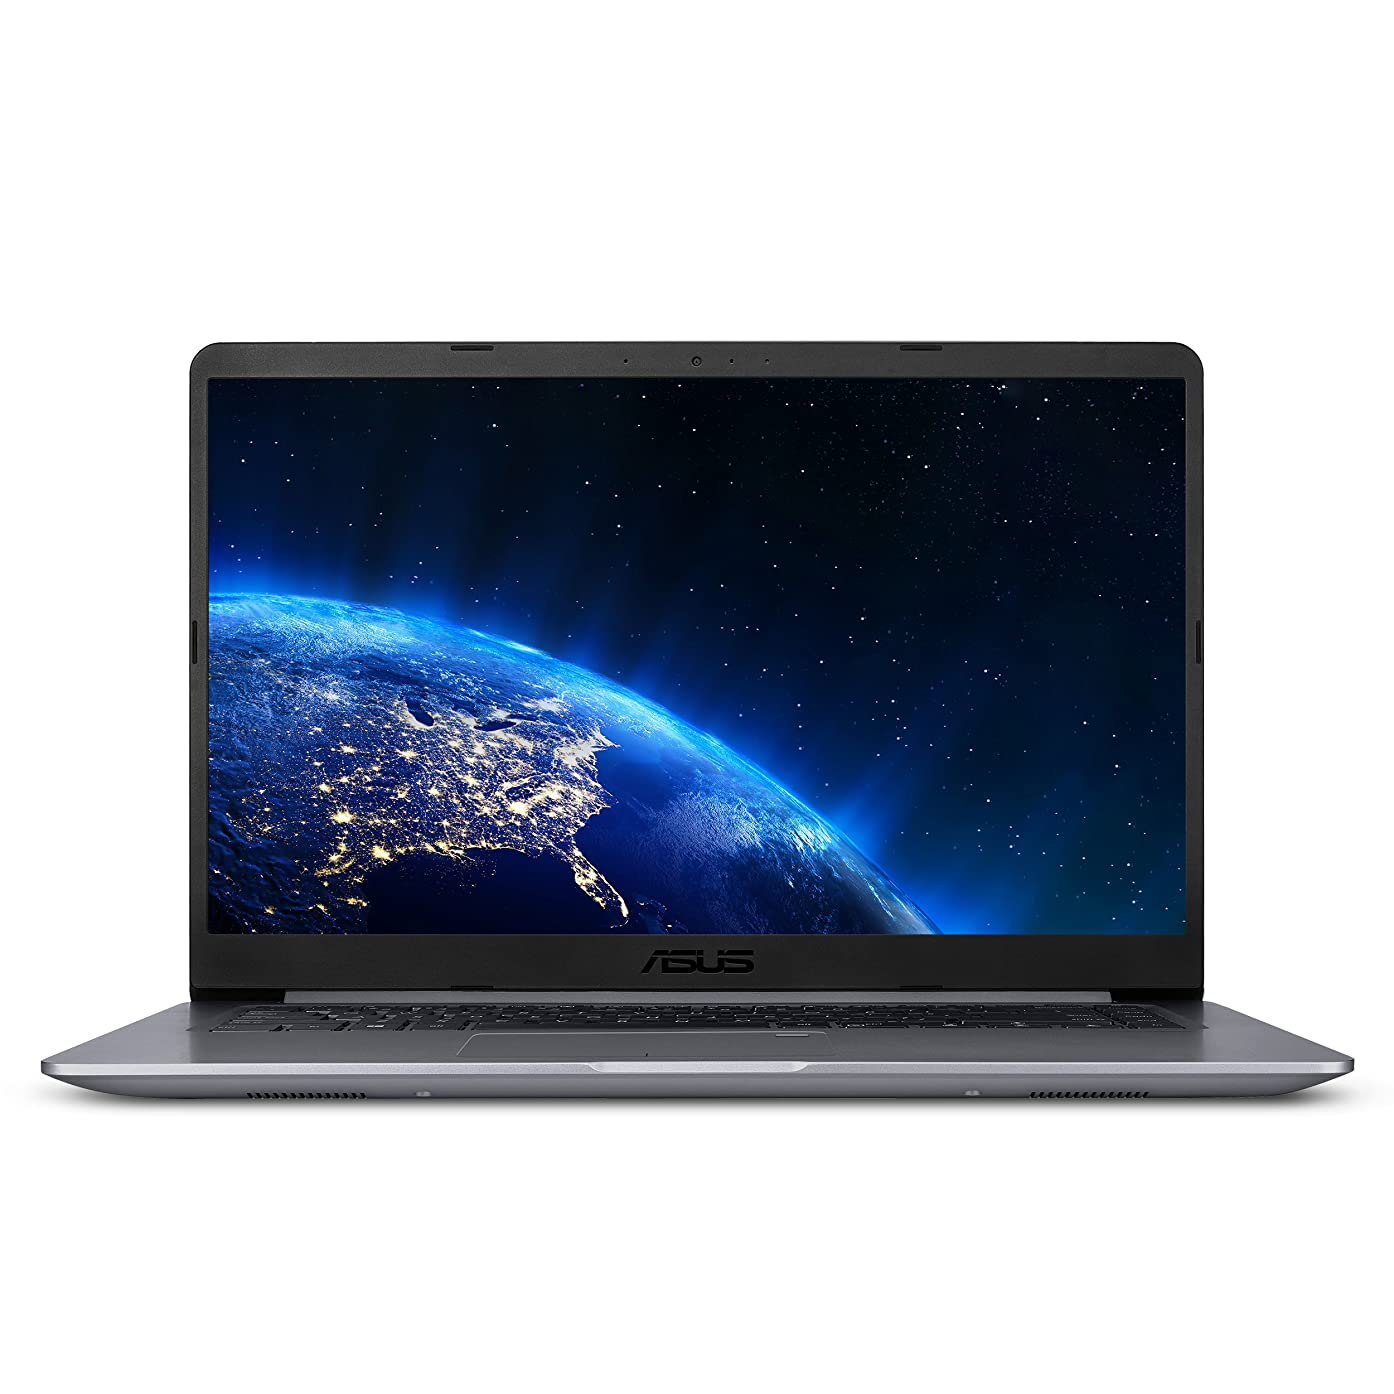 "ASUS VivoBook F510QA Thin & Lightweight Laptop, 15.6"" FHD WideView, AMD Quad Core A12-9720P Processor, 8GB RAM, 256G SSD, Fingerprint Reader, Windows 10 in S Mode, F510QA-DS99"